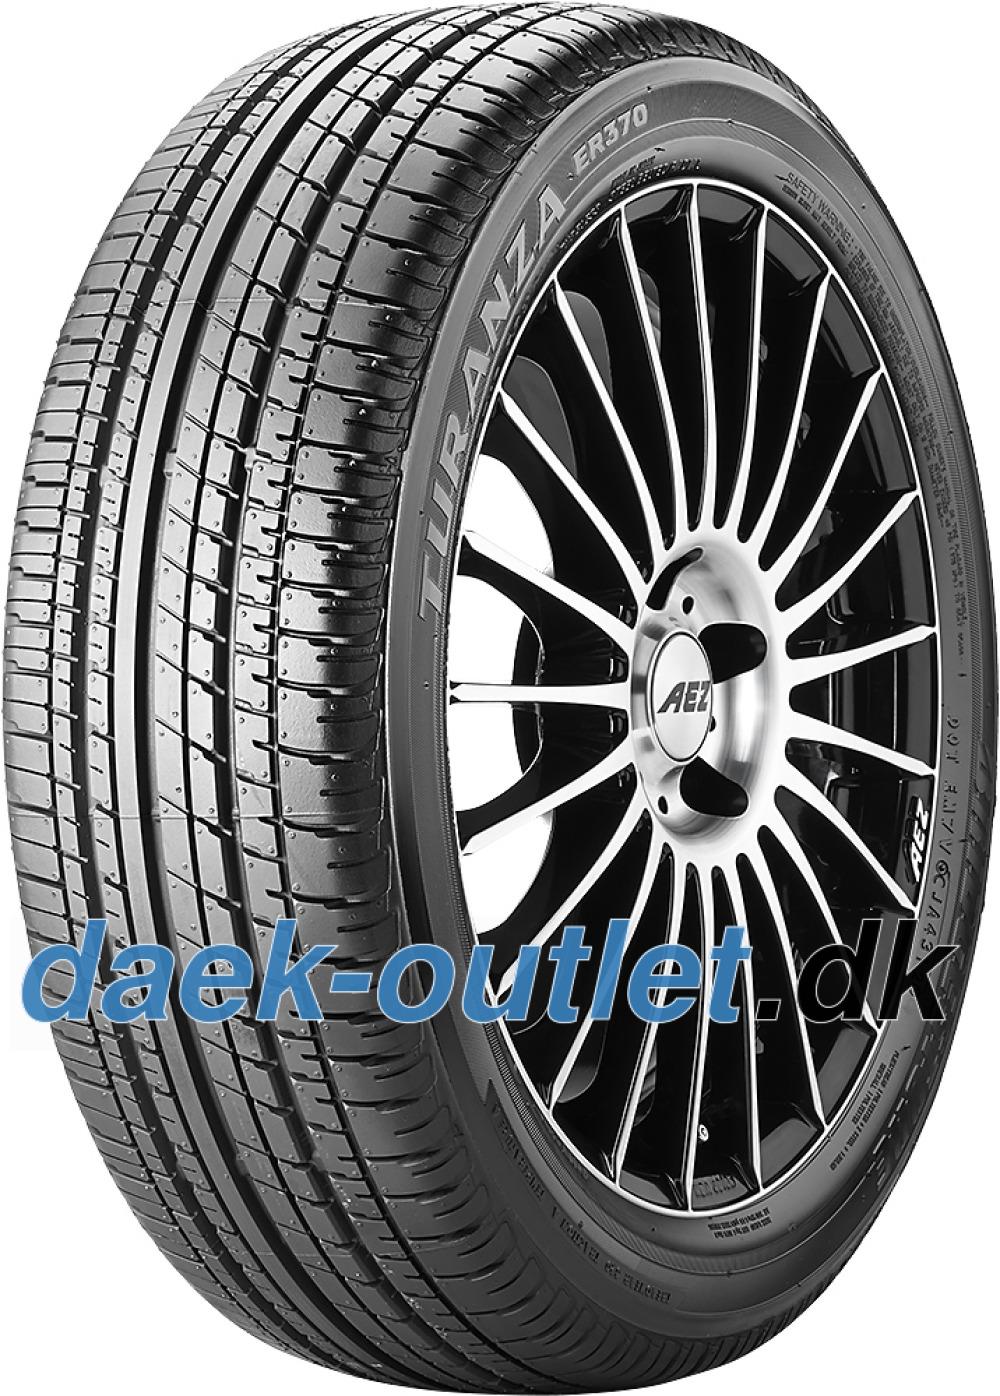 Bridgestone Turanza ER 370 ( 185/55 R16 83H )